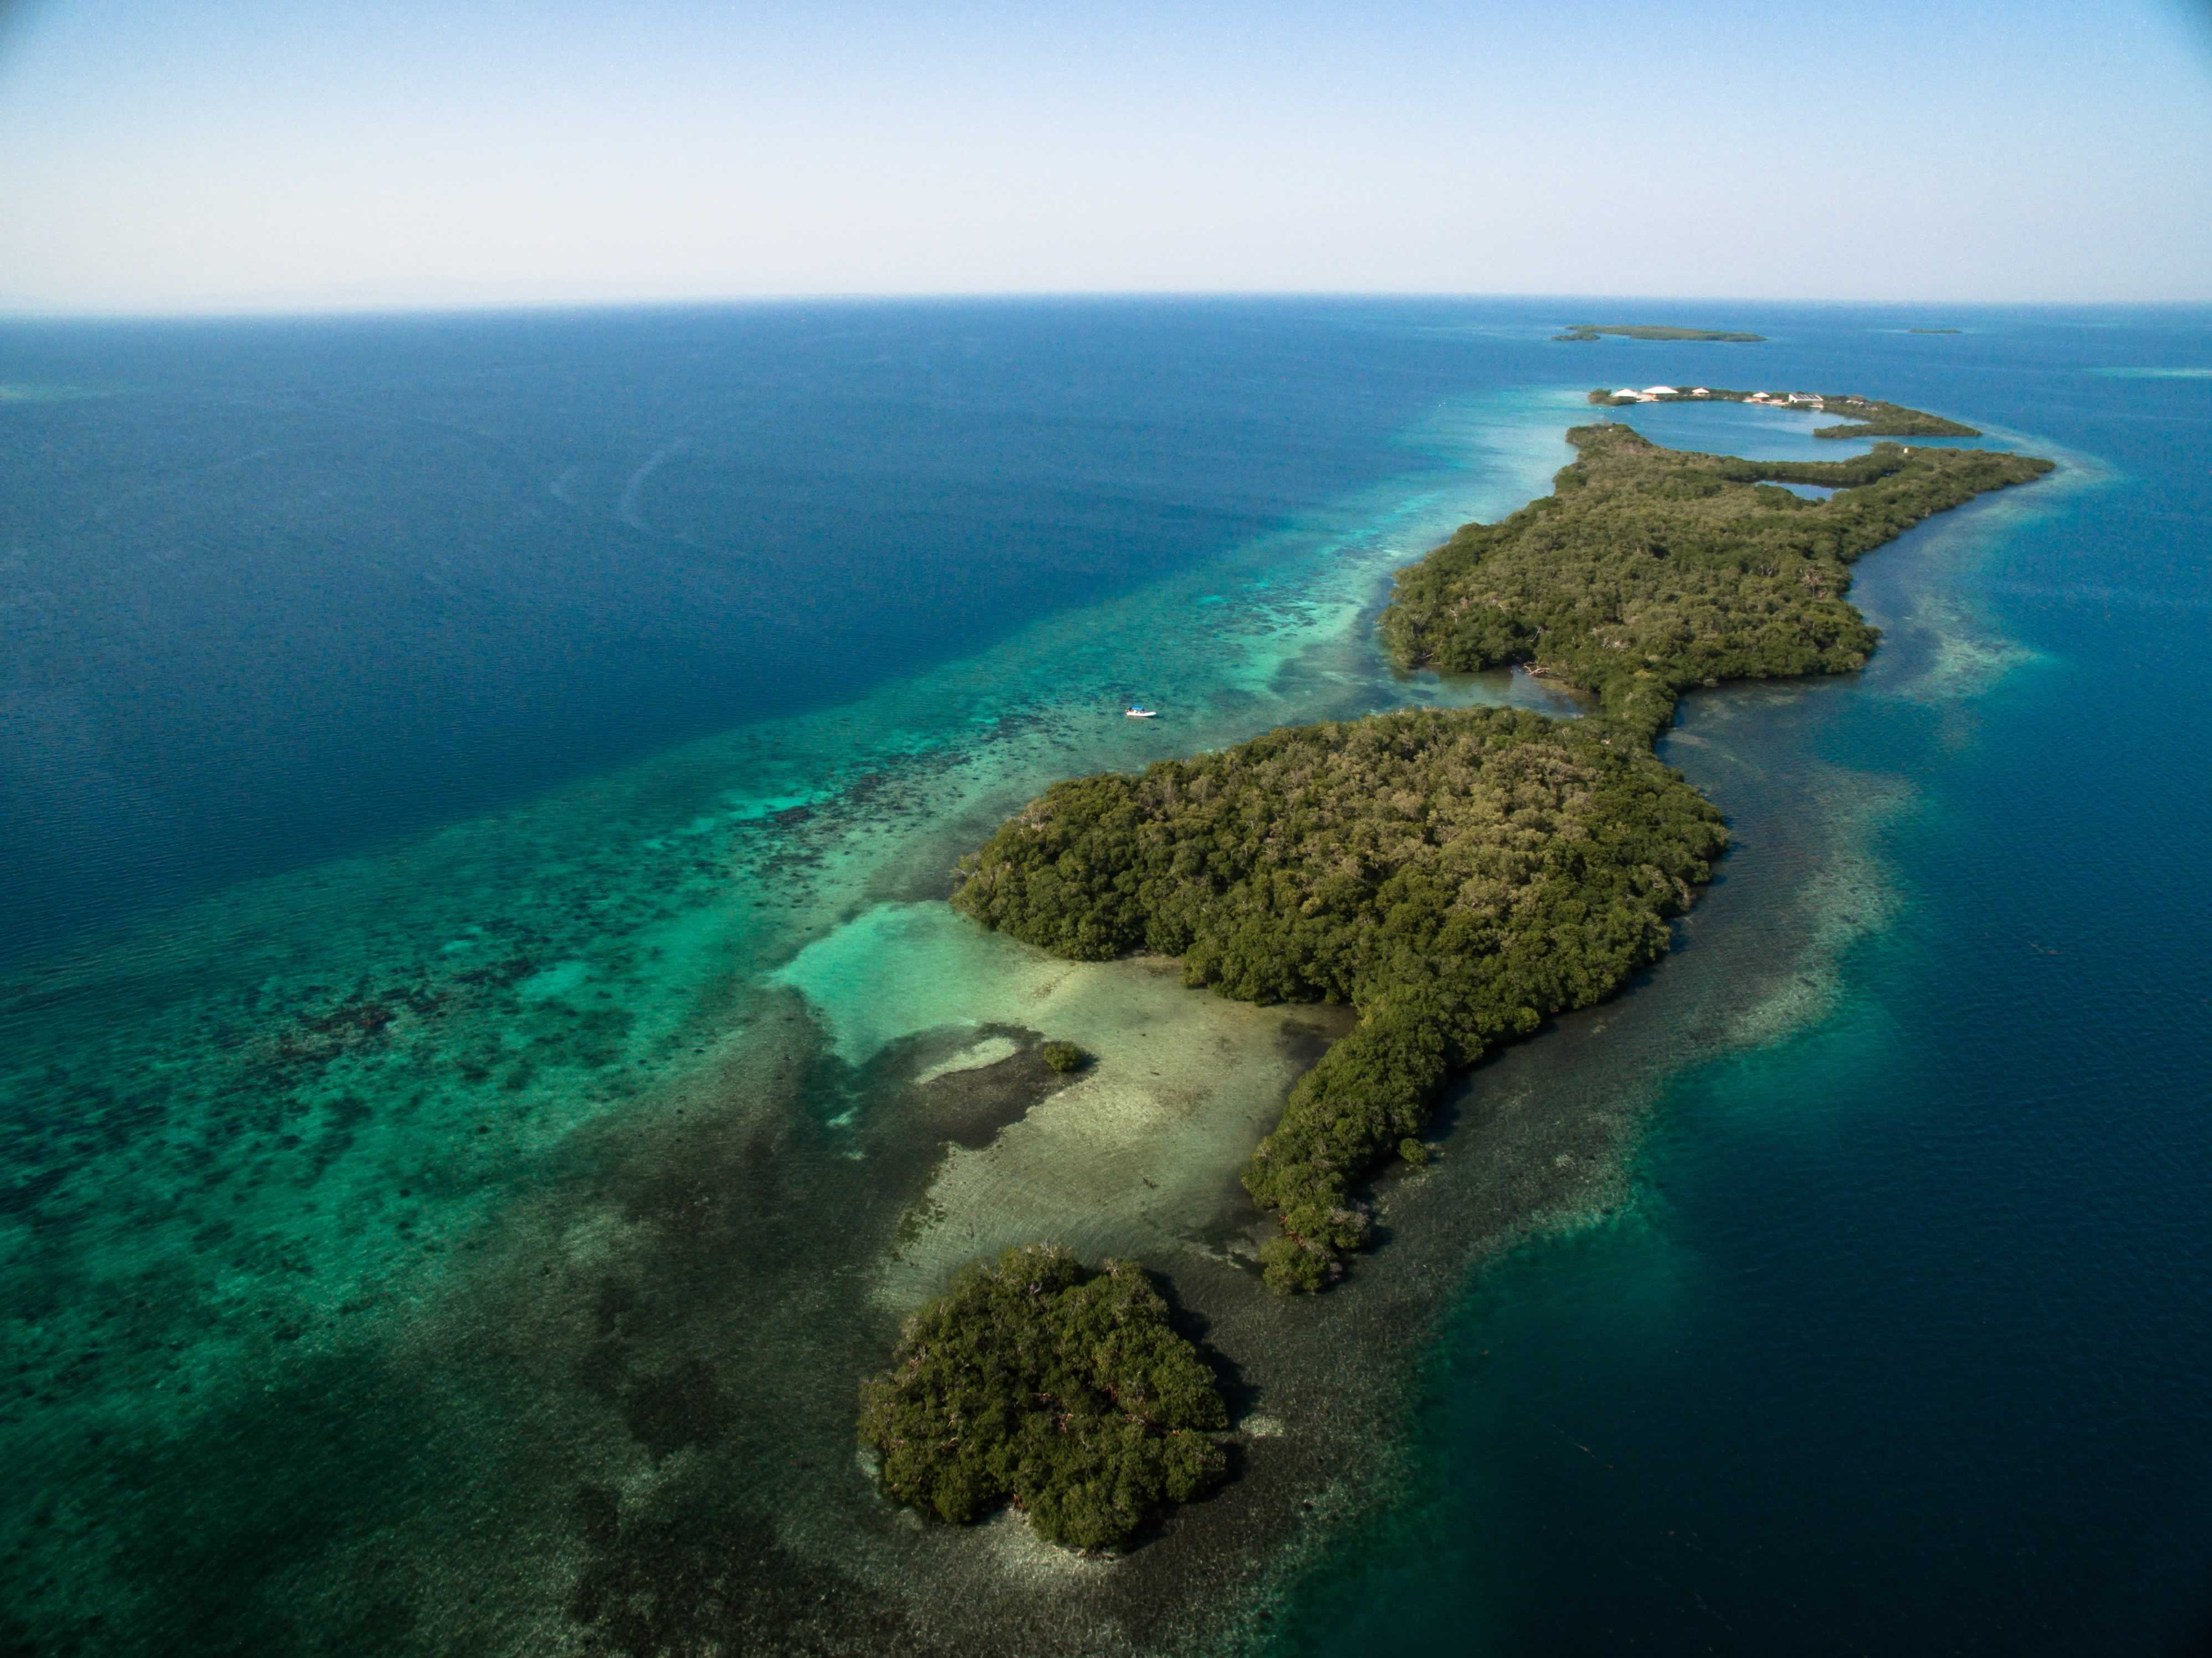 Saddle Caye 2.19 - Belize, Central America - Private Islands for Sale